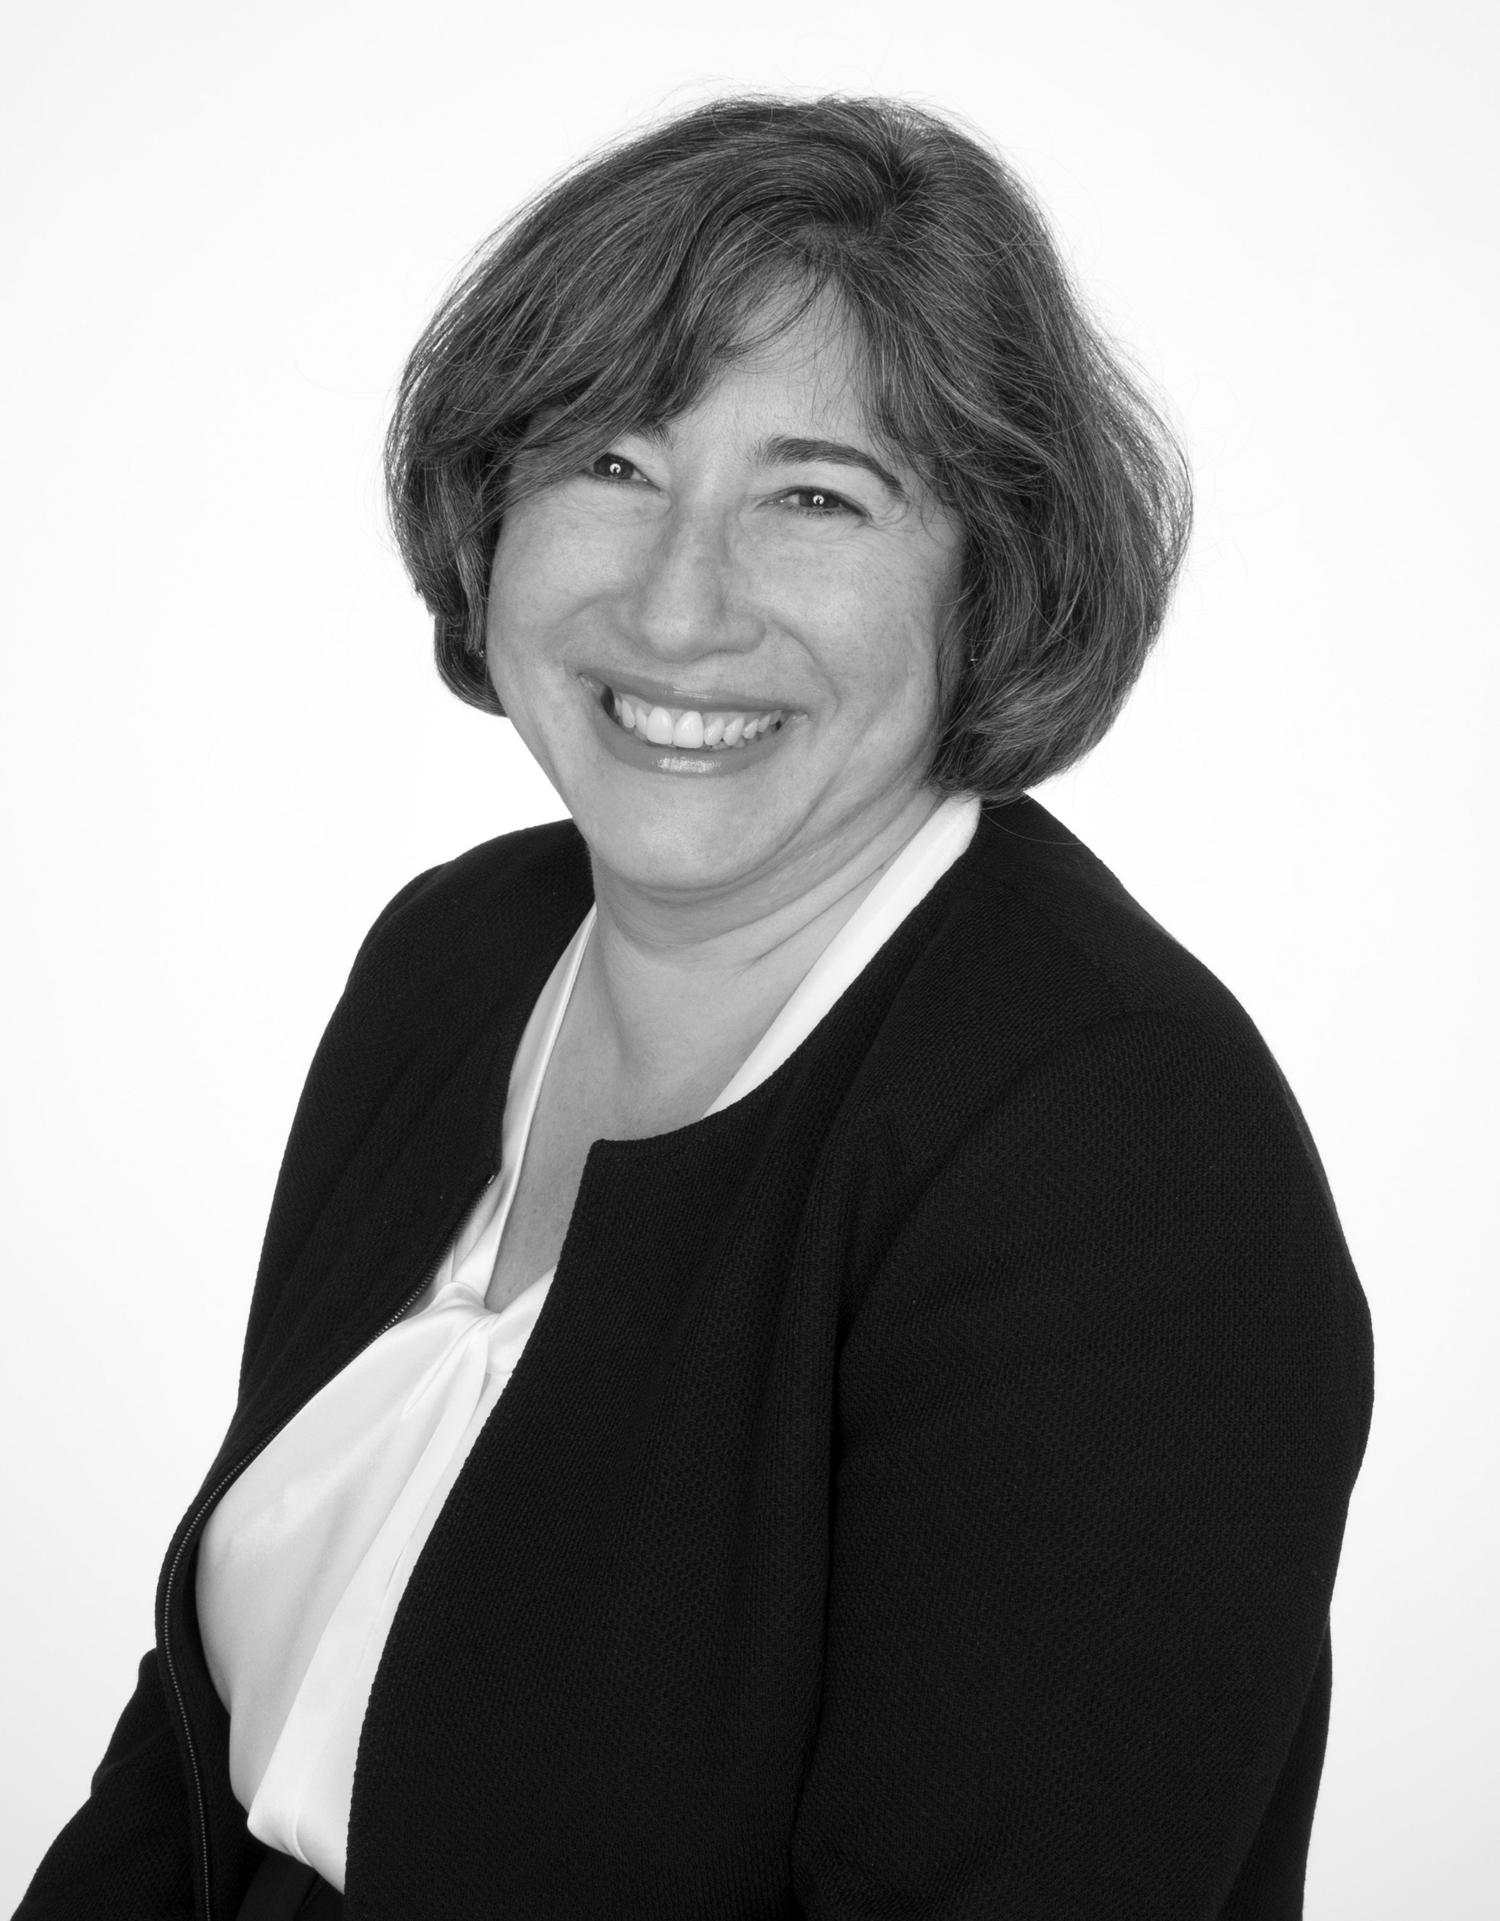 Studer Conference Keynote Speaker Barbara Roehl, MD, MBA